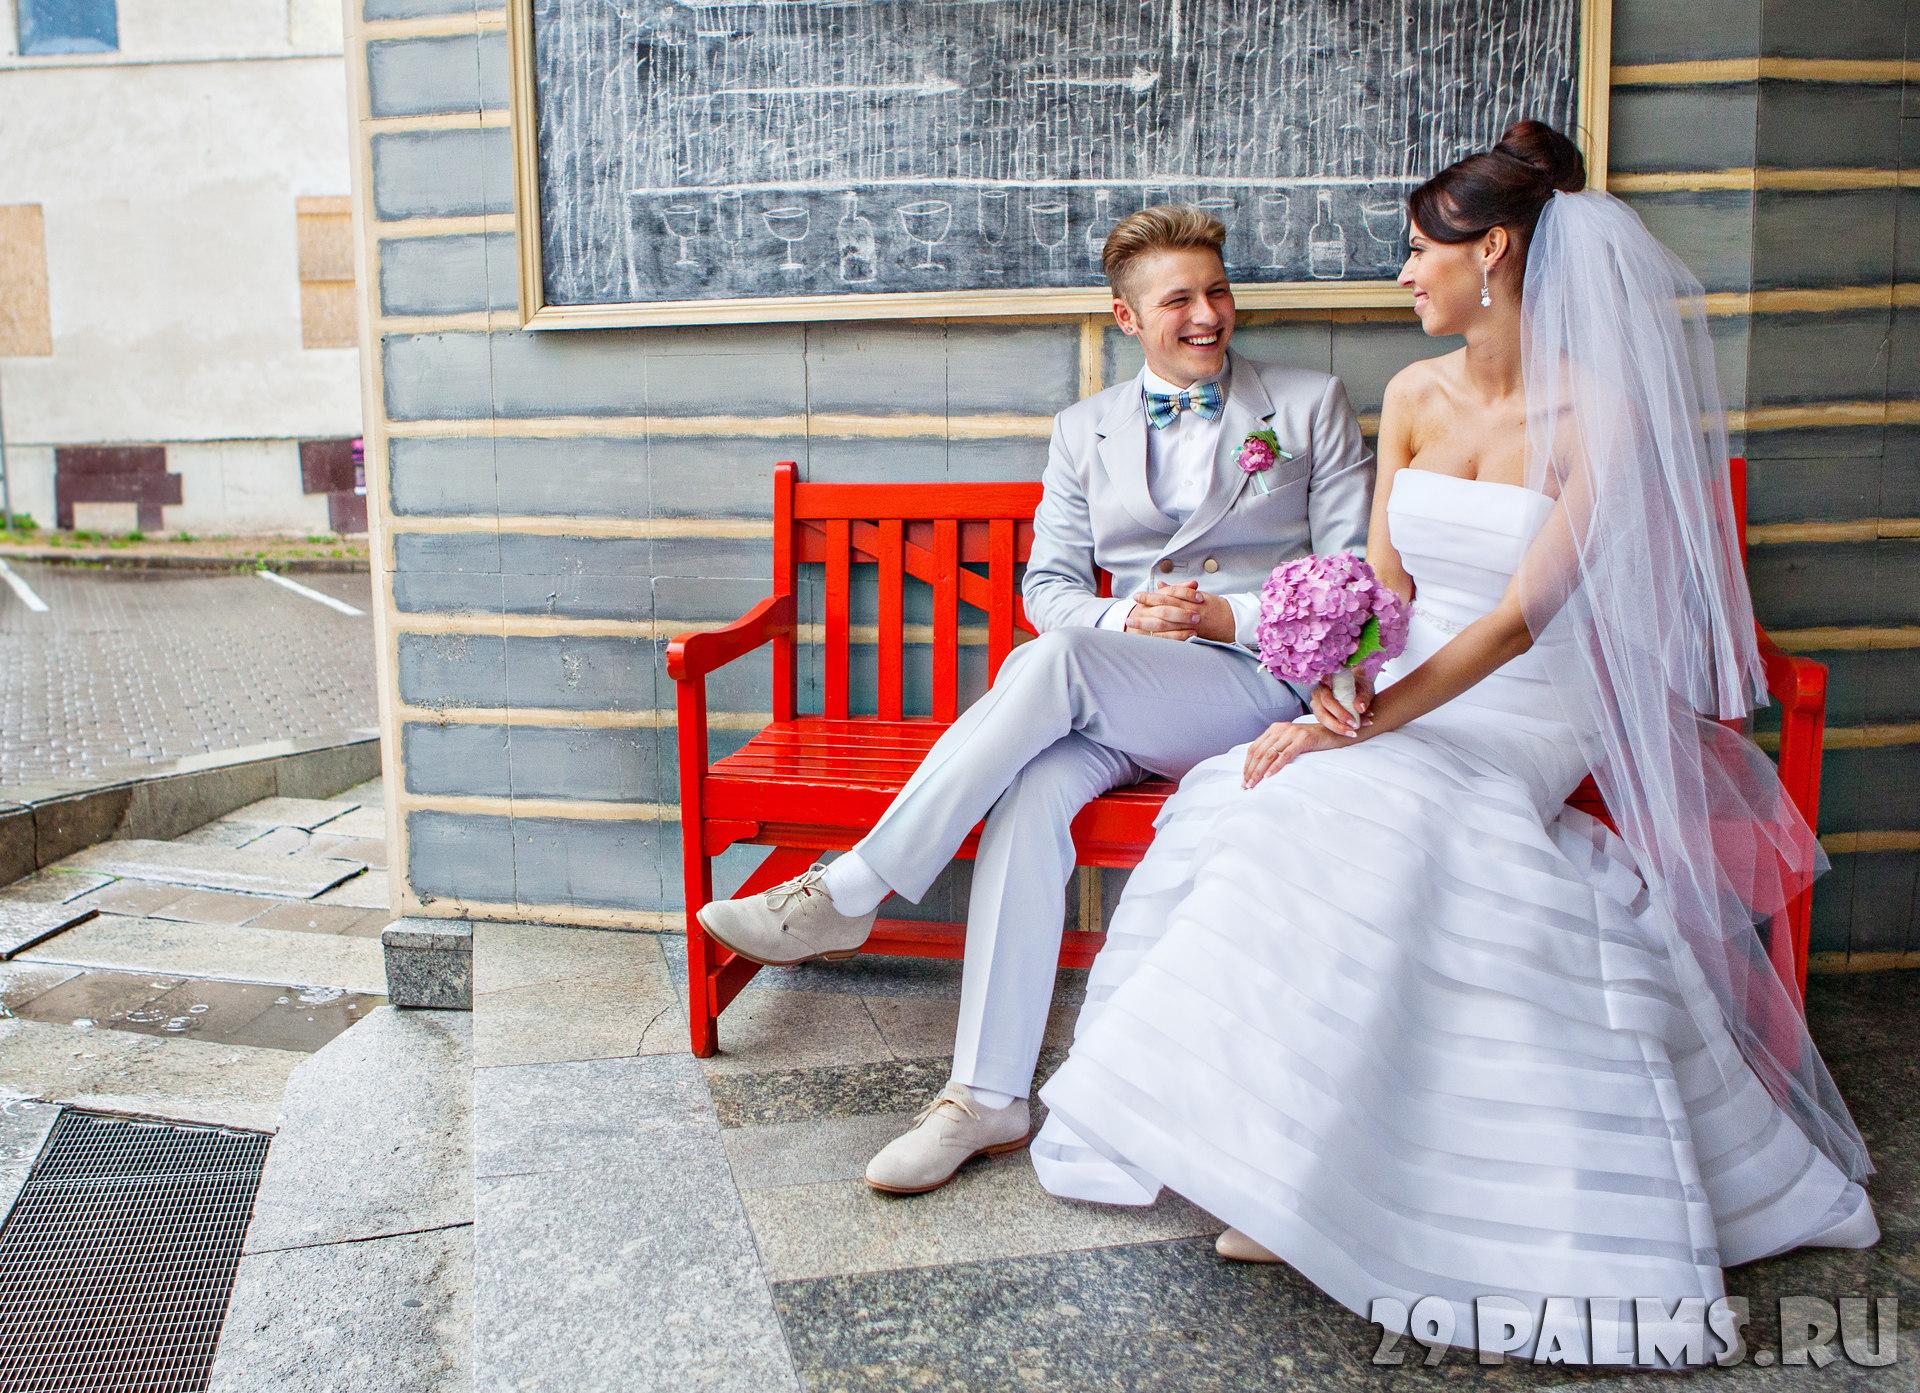 Ах эта свадьба фото